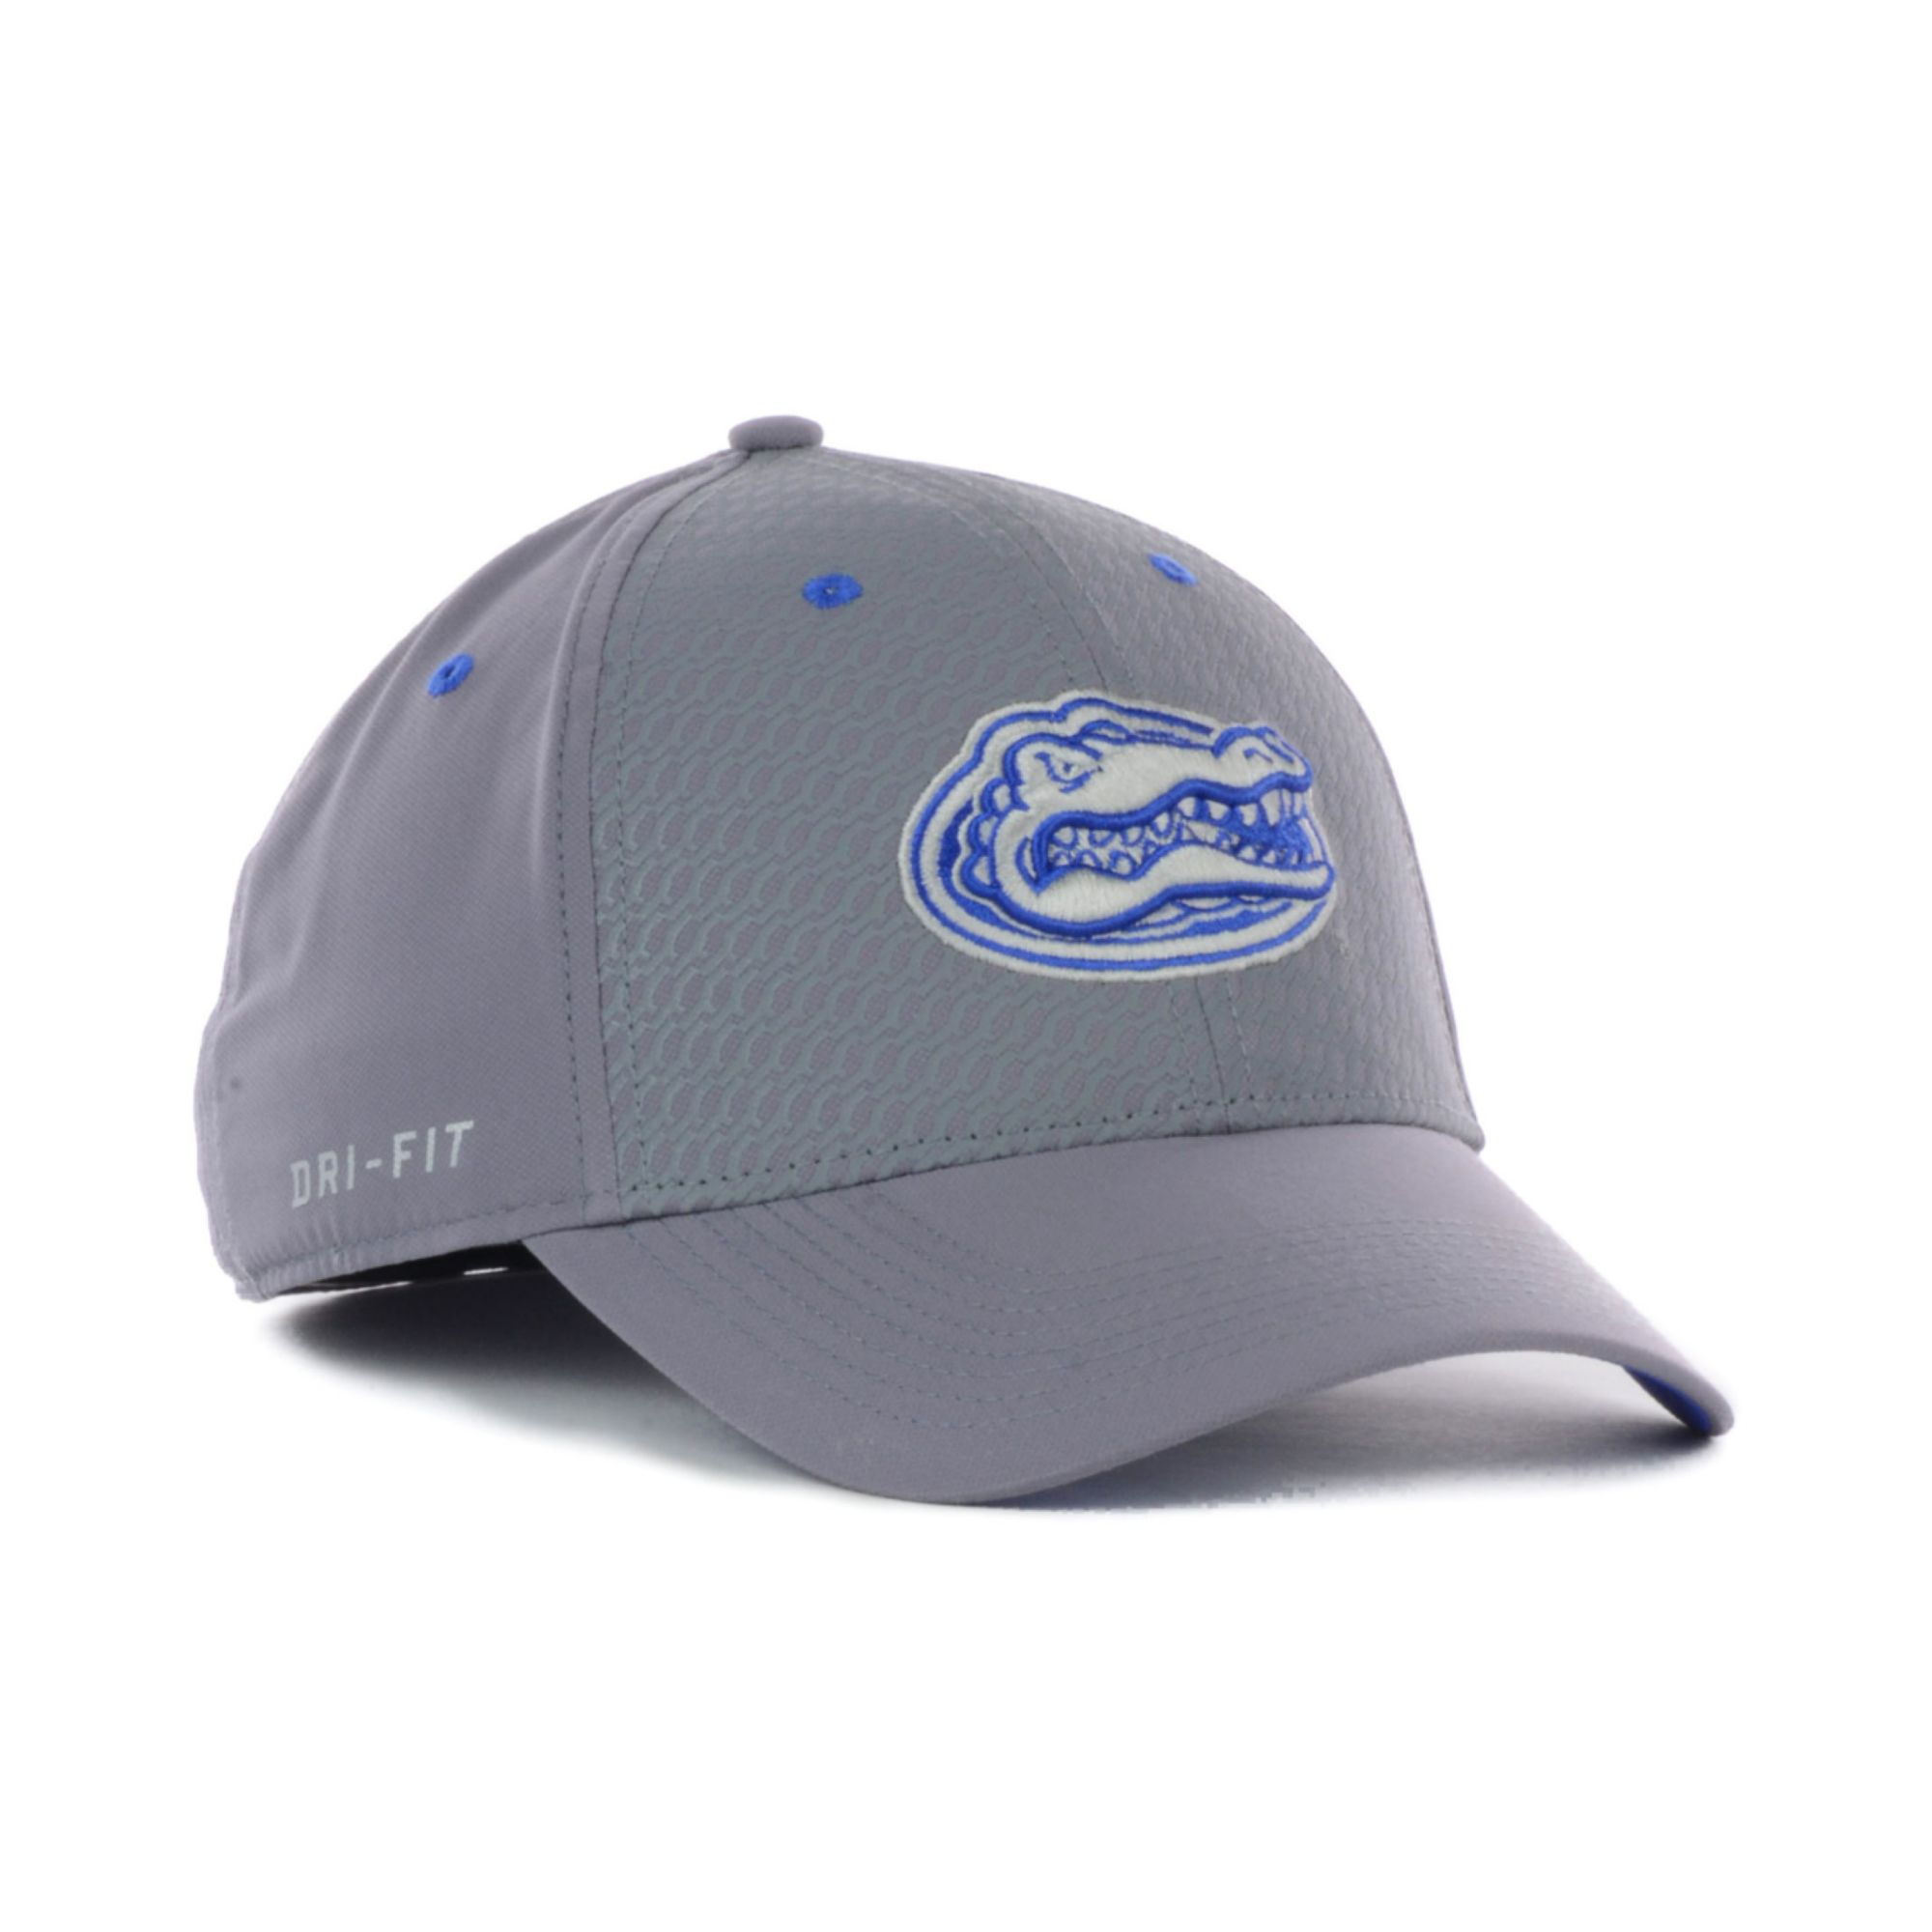 online store 22055 e0265 Nike Florida Gators Superfan Swf Cap in Gray for Men - Lyst